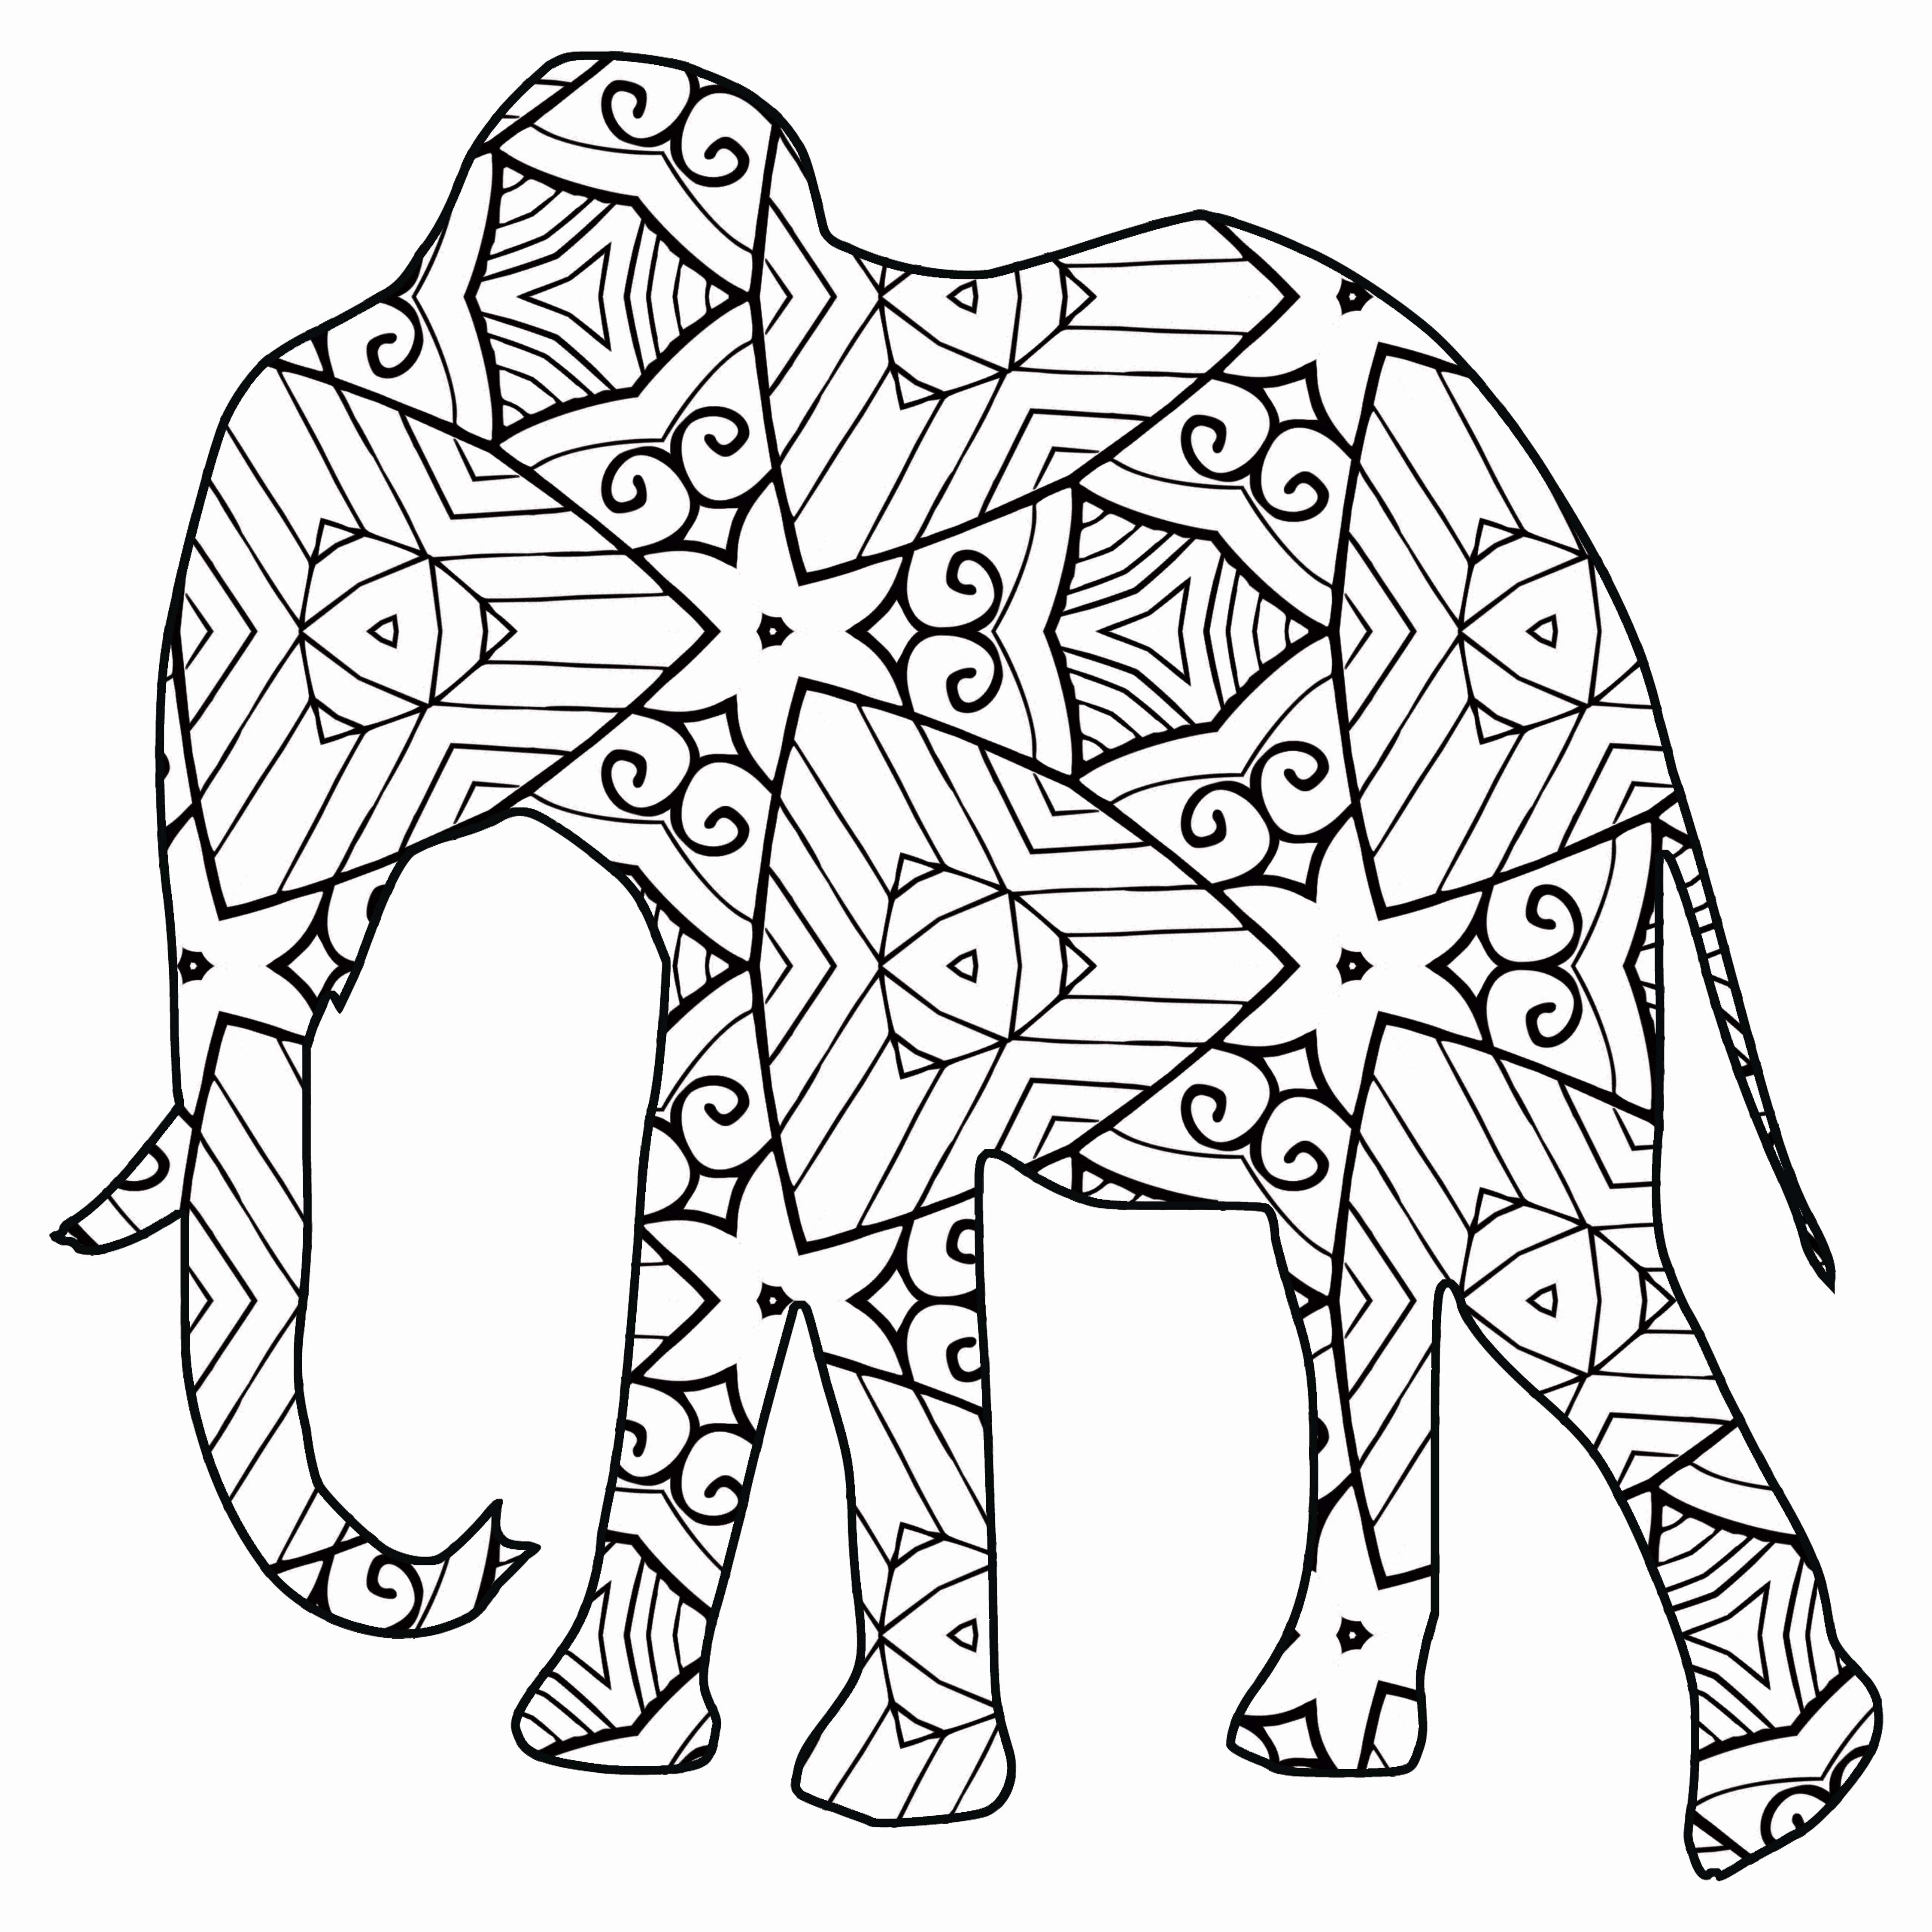 Animal Coloring Pages Elegant 30 Free Printable Geometric Animal Coloring Pages Farm Animal Coloring Pages Animal Coloring Pages Deer Coloring Pages